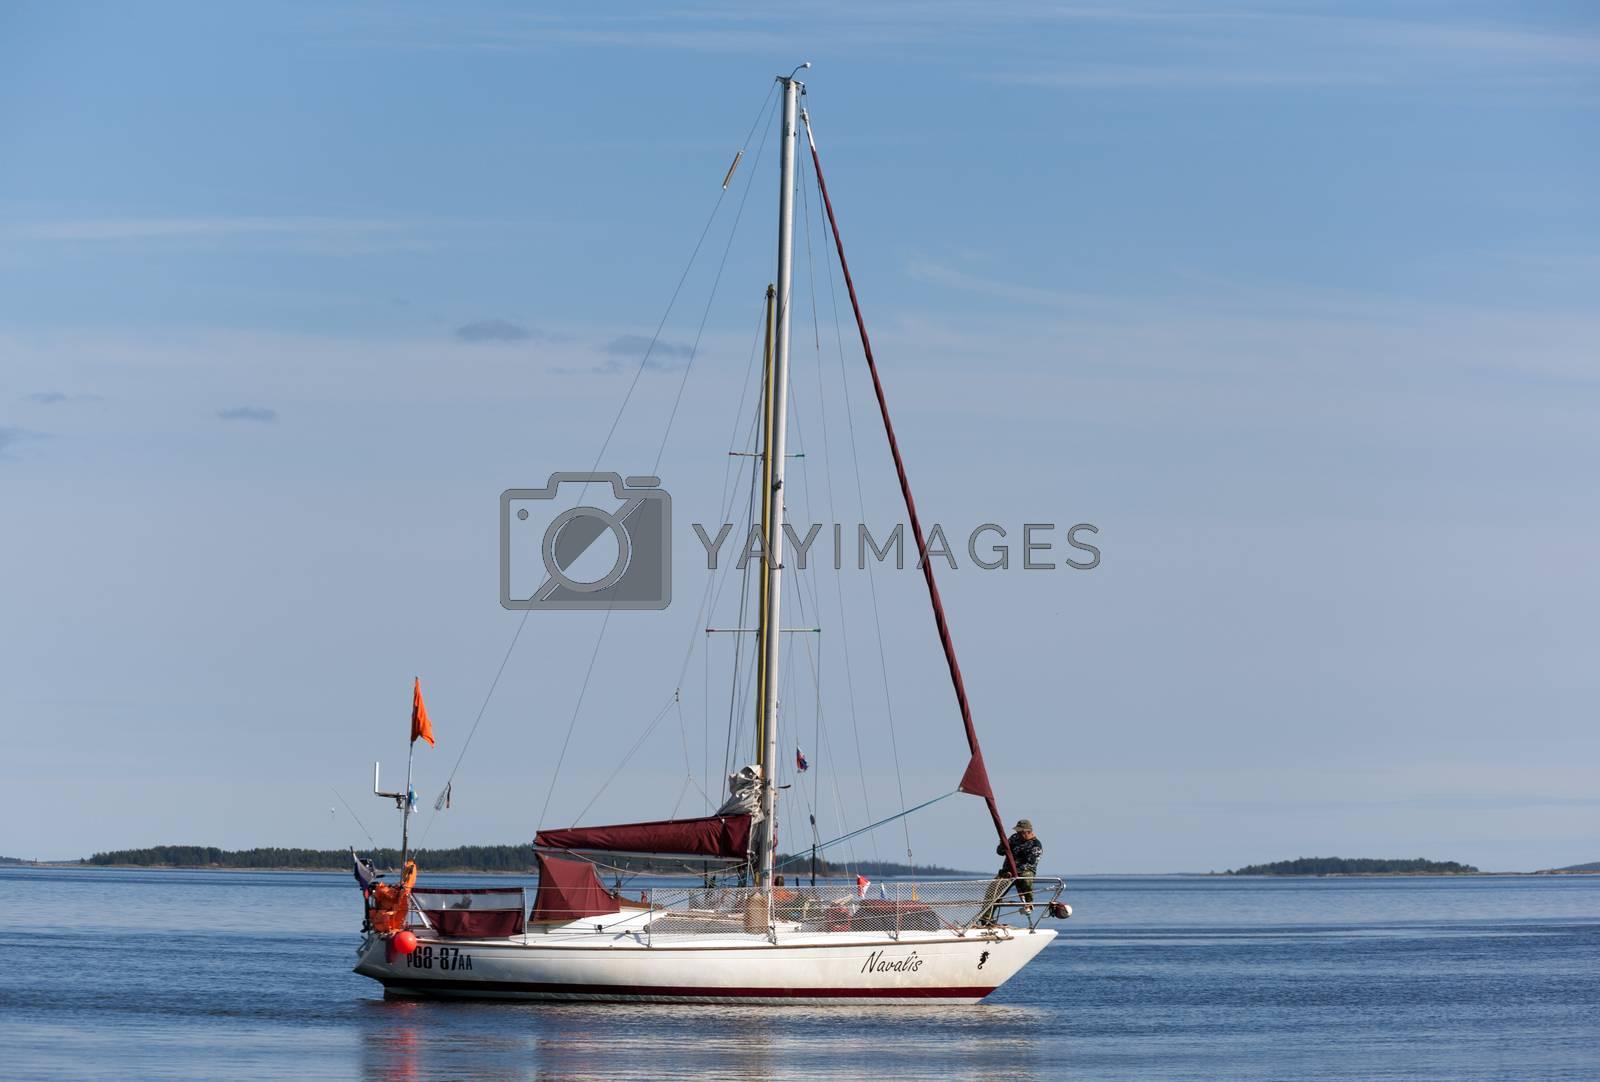 "Russia, Kandalaksha - JUNE 30, 2015: The regatta of cruiser yachts in the White Sea. Judging boat yacht ""Navalis"" Arkhangelsk"